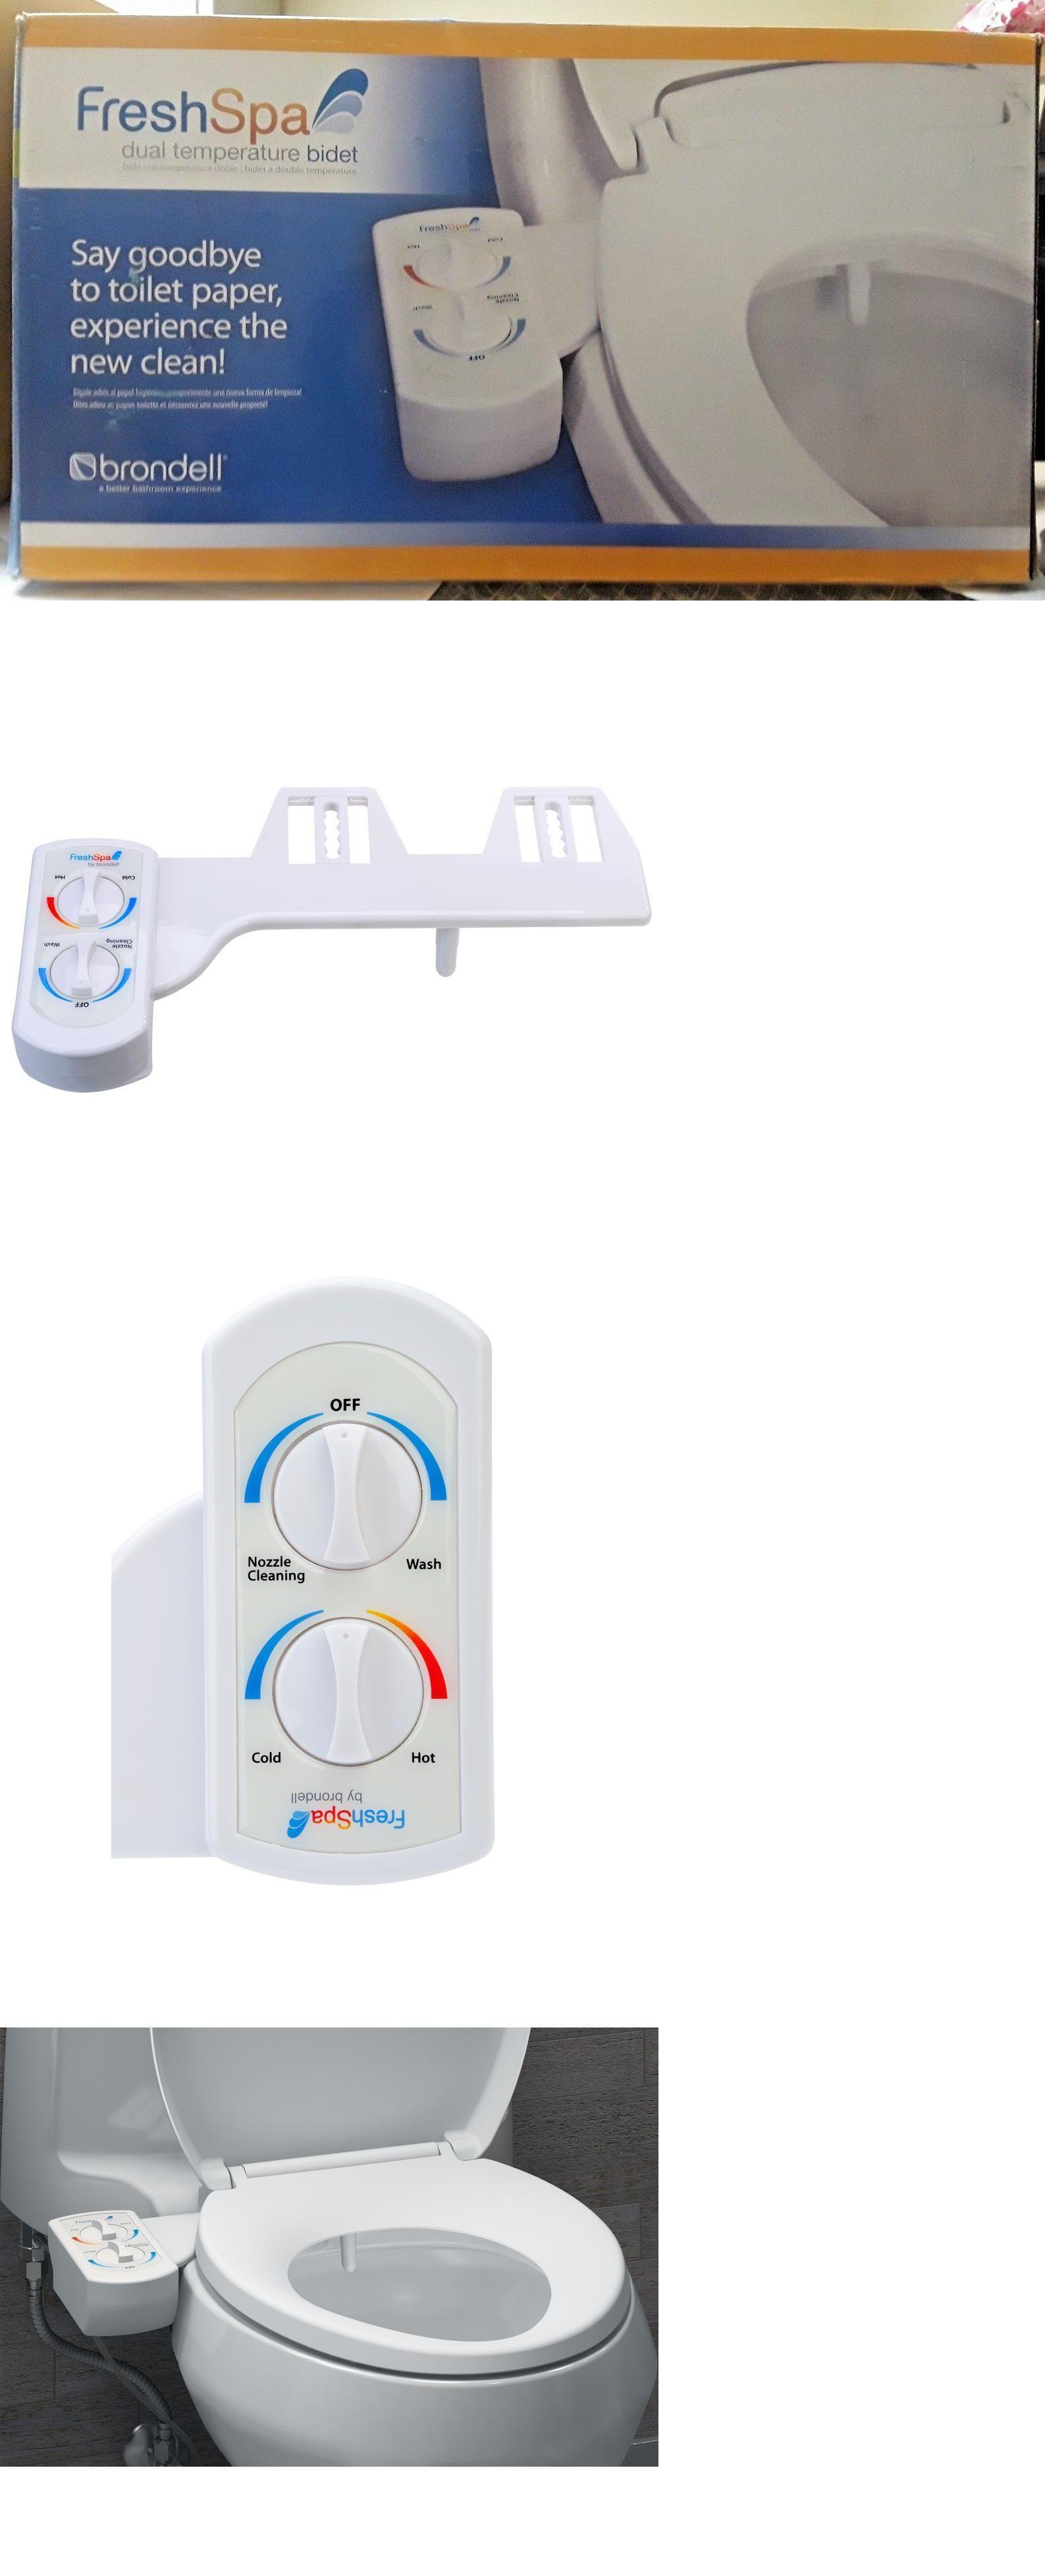 Bidets And Toilet Attachments 101405 Brondell Model Fsw 20 Dual